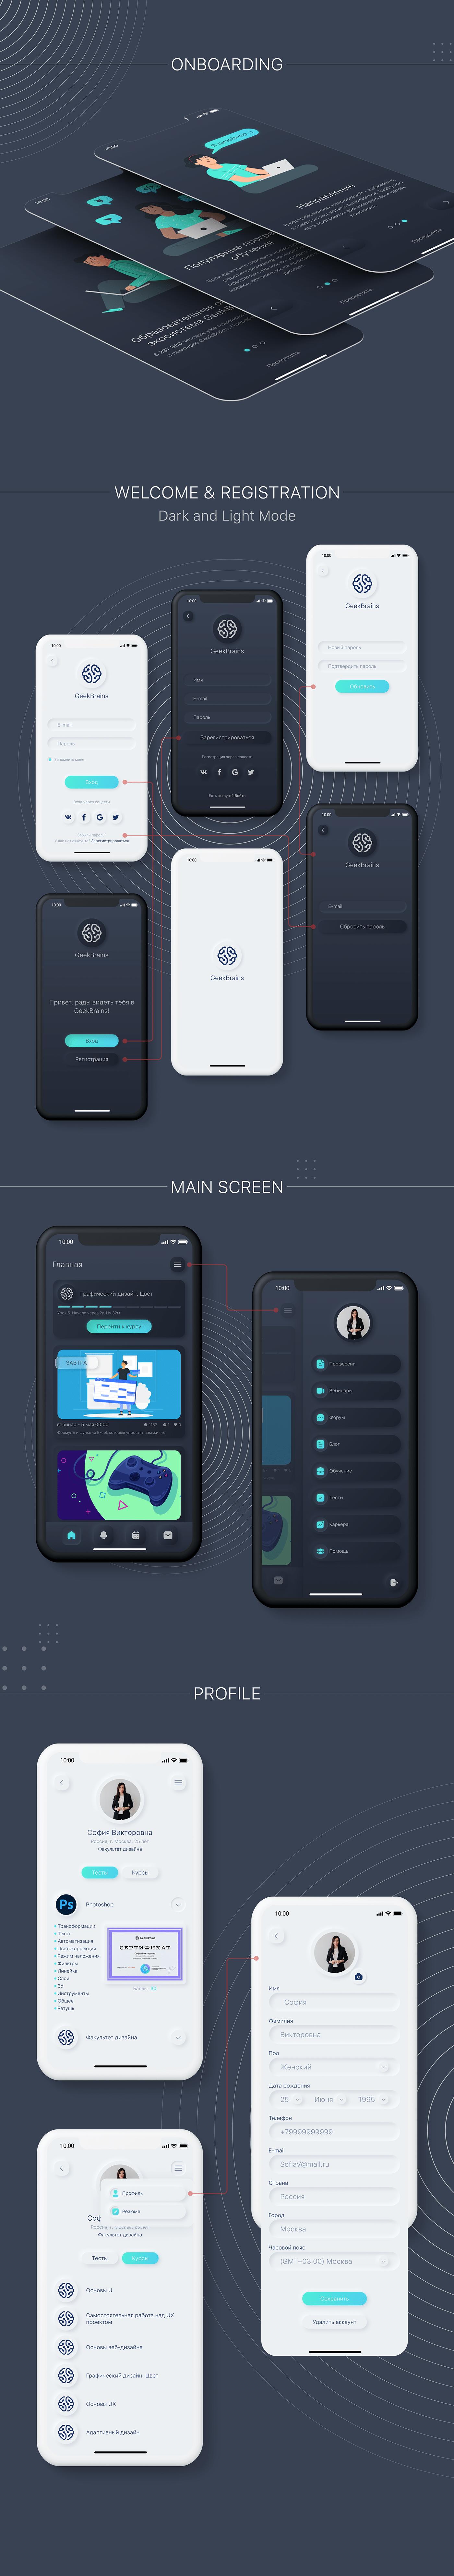 app design Interface mobile UI ux